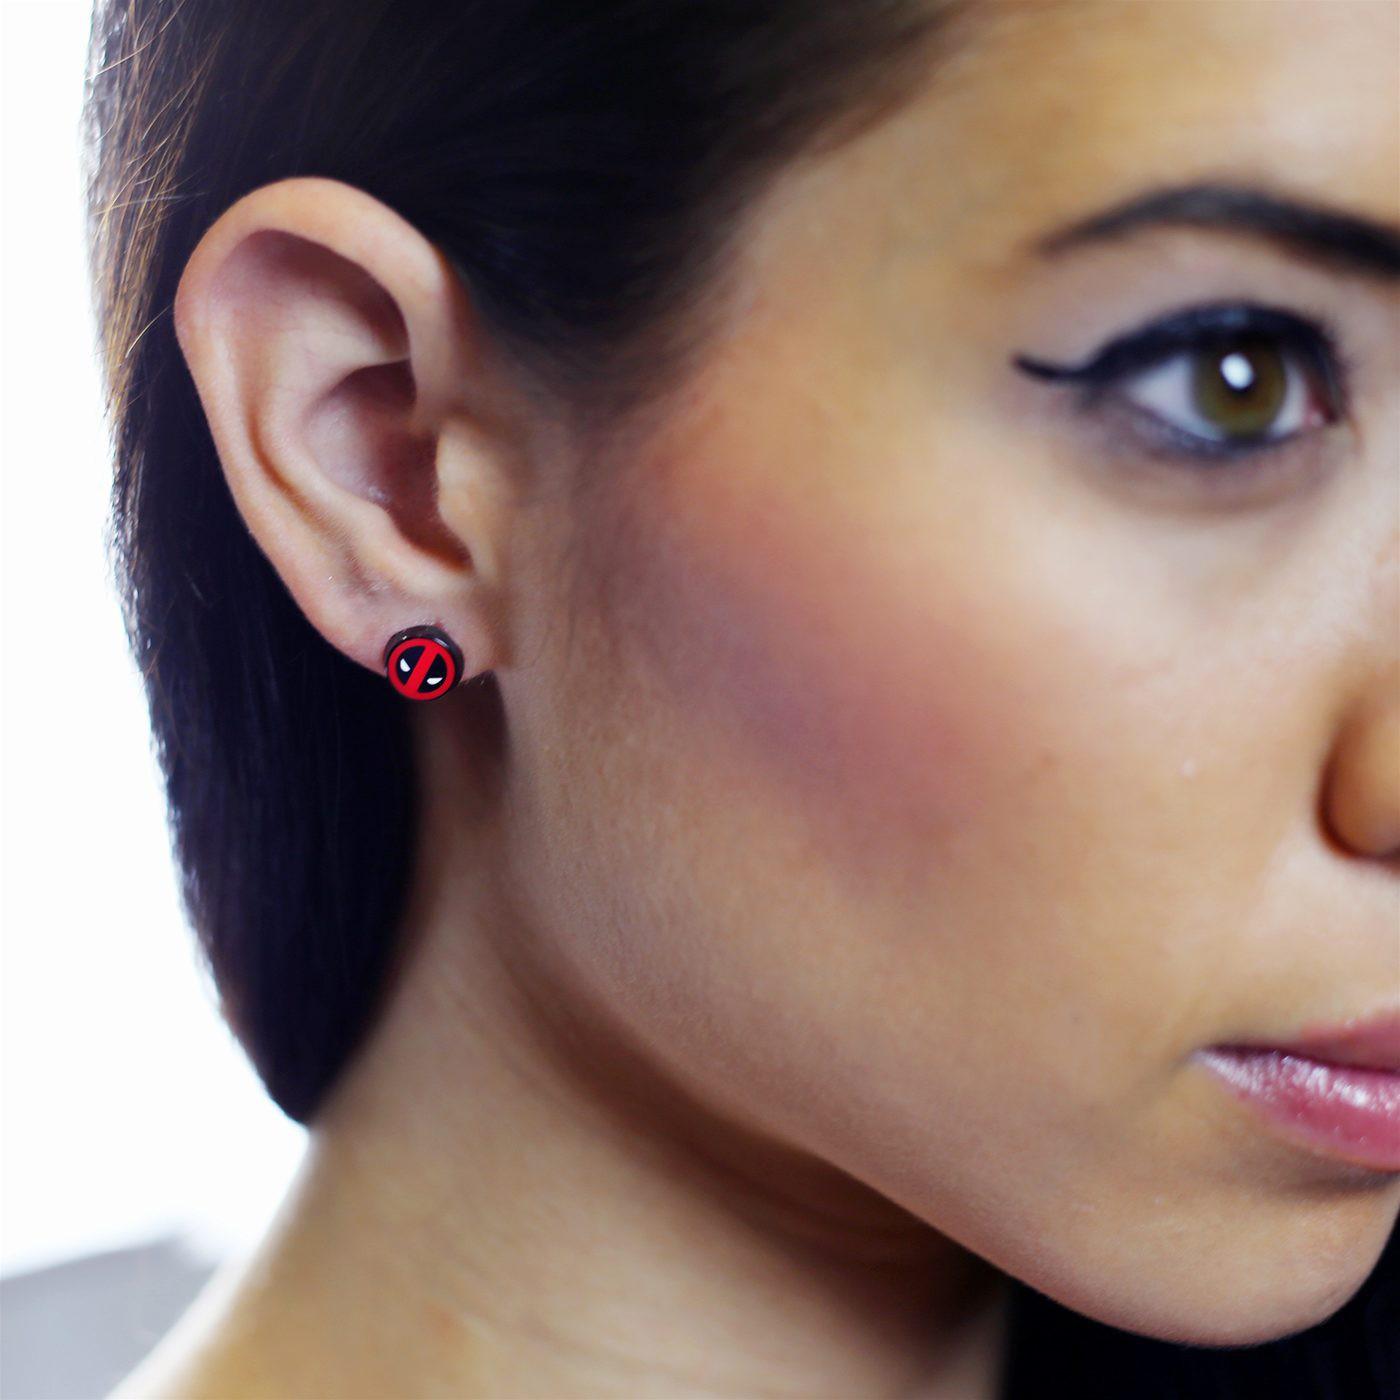 Deadpool Symbol Stud Earrings